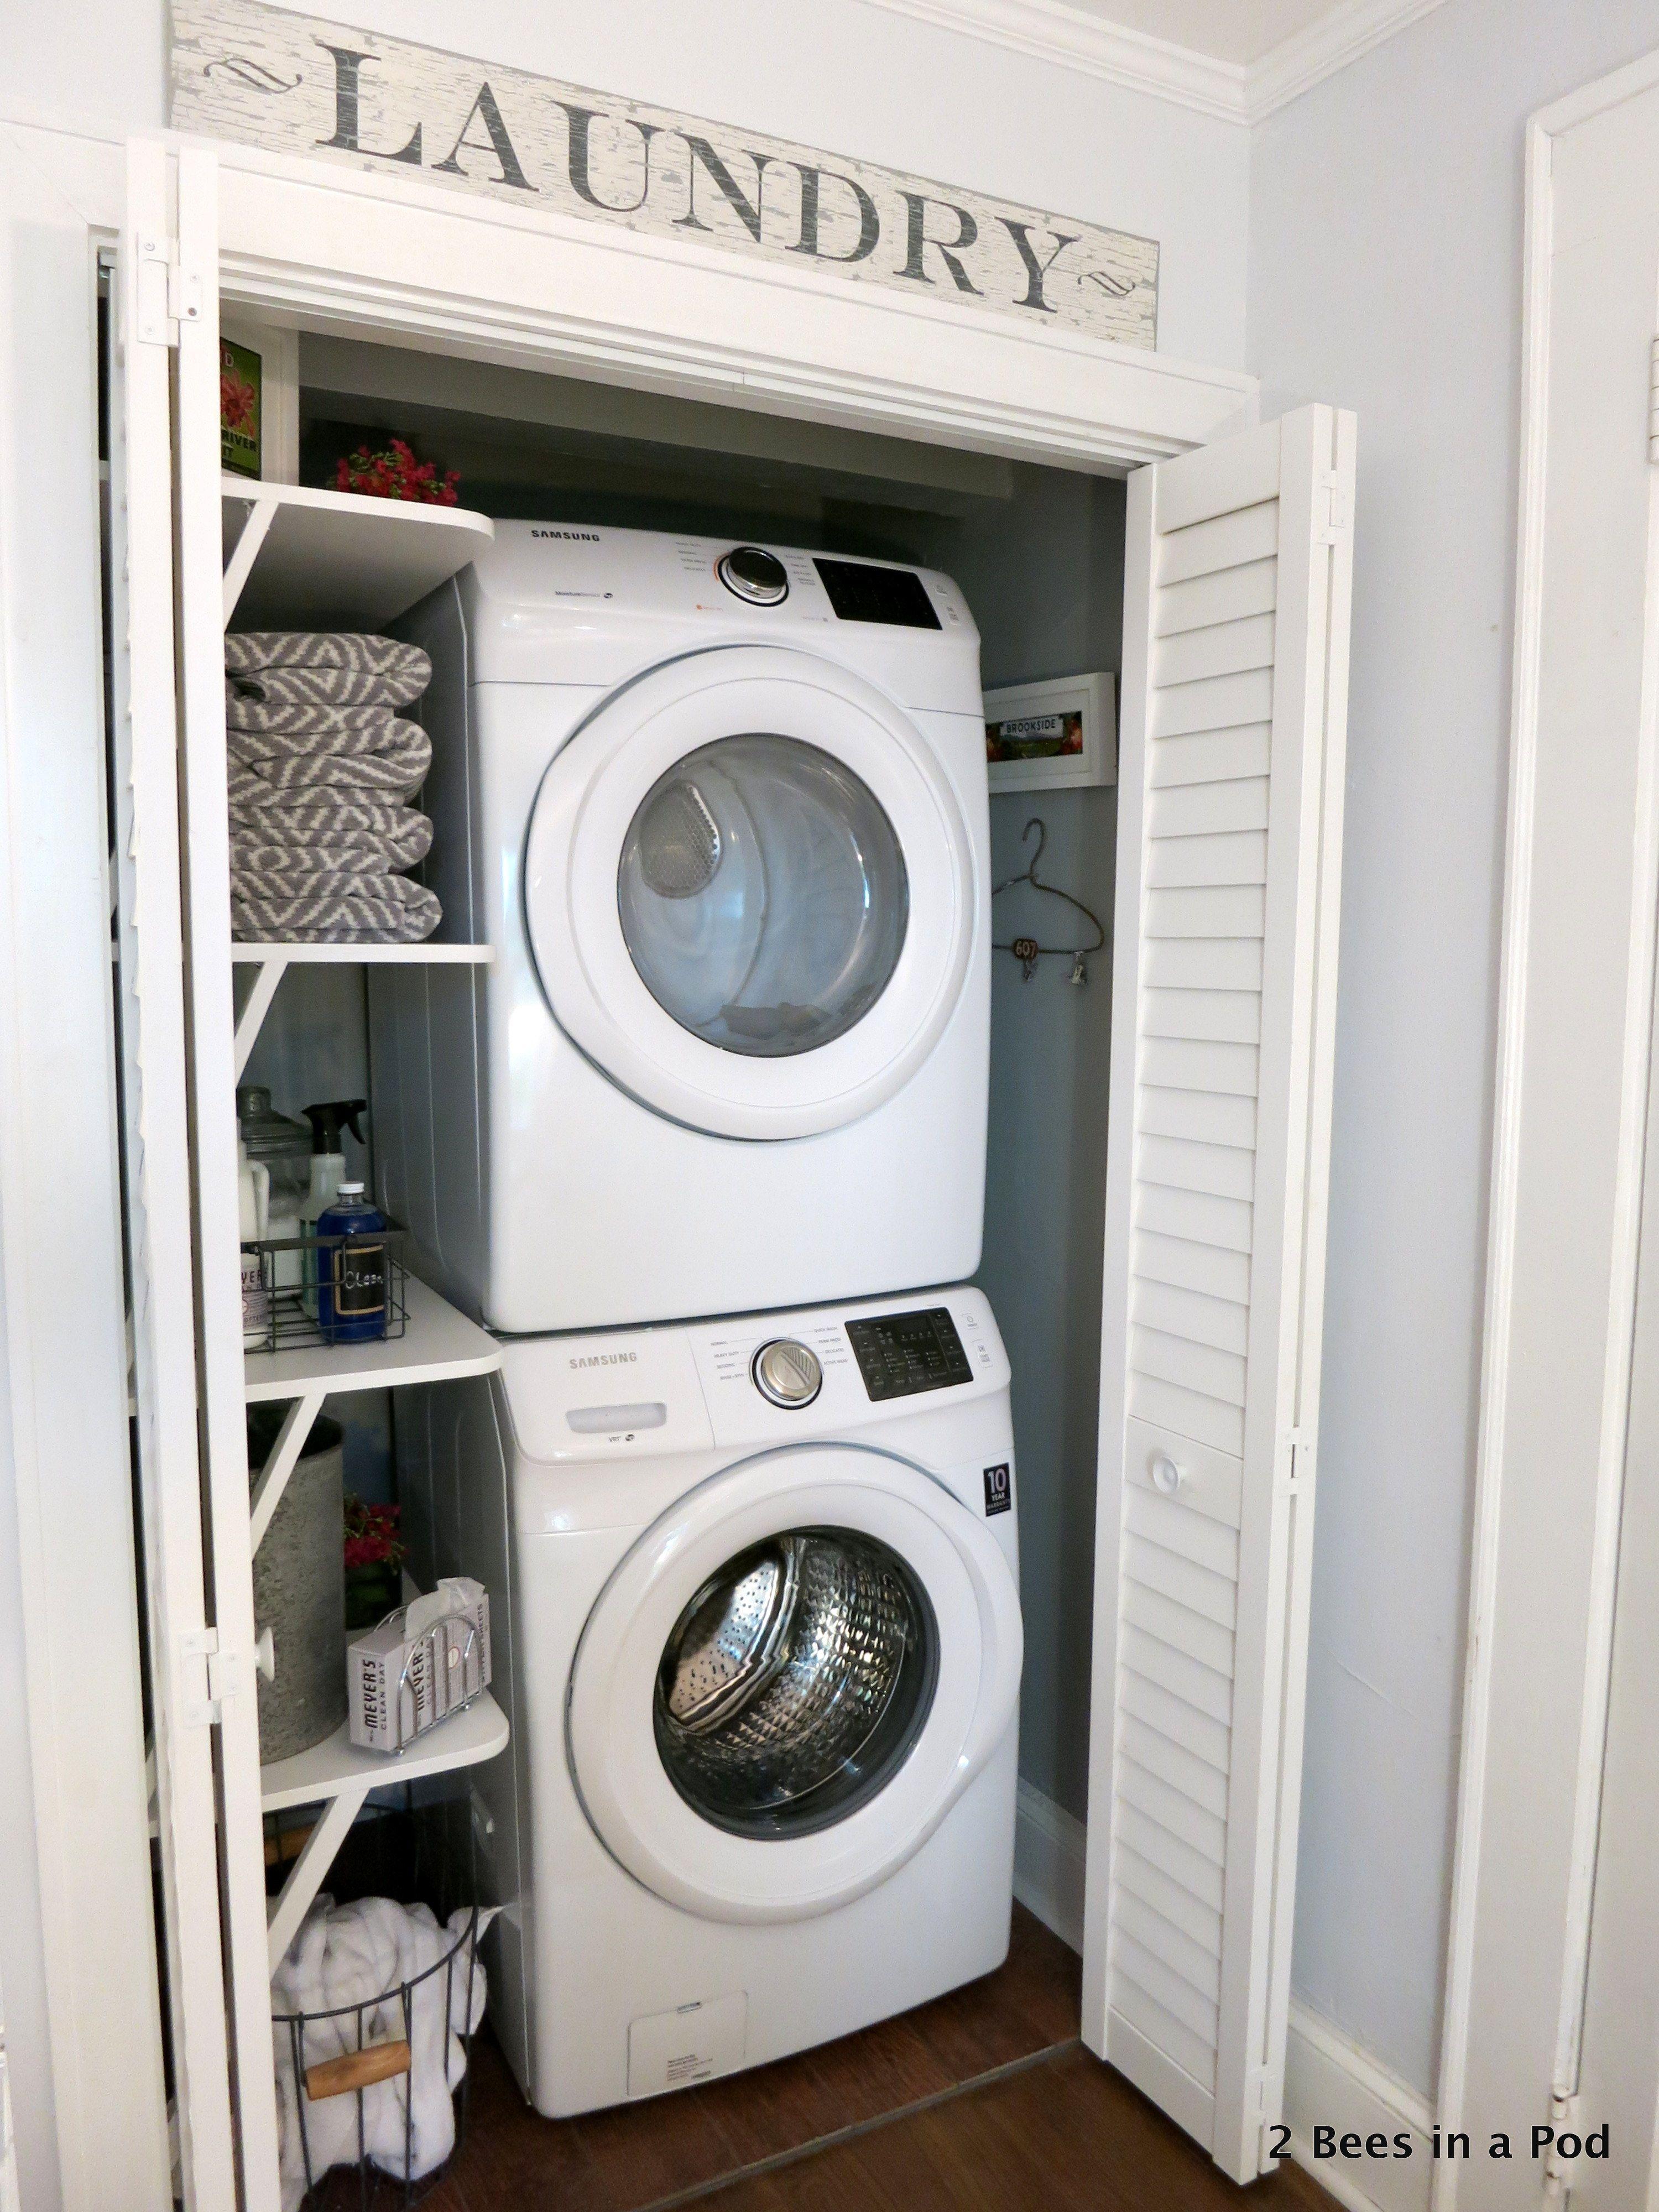 laundry | laundry room | laundry closet | laundry closet ideas | laundry room ideas | home design | design